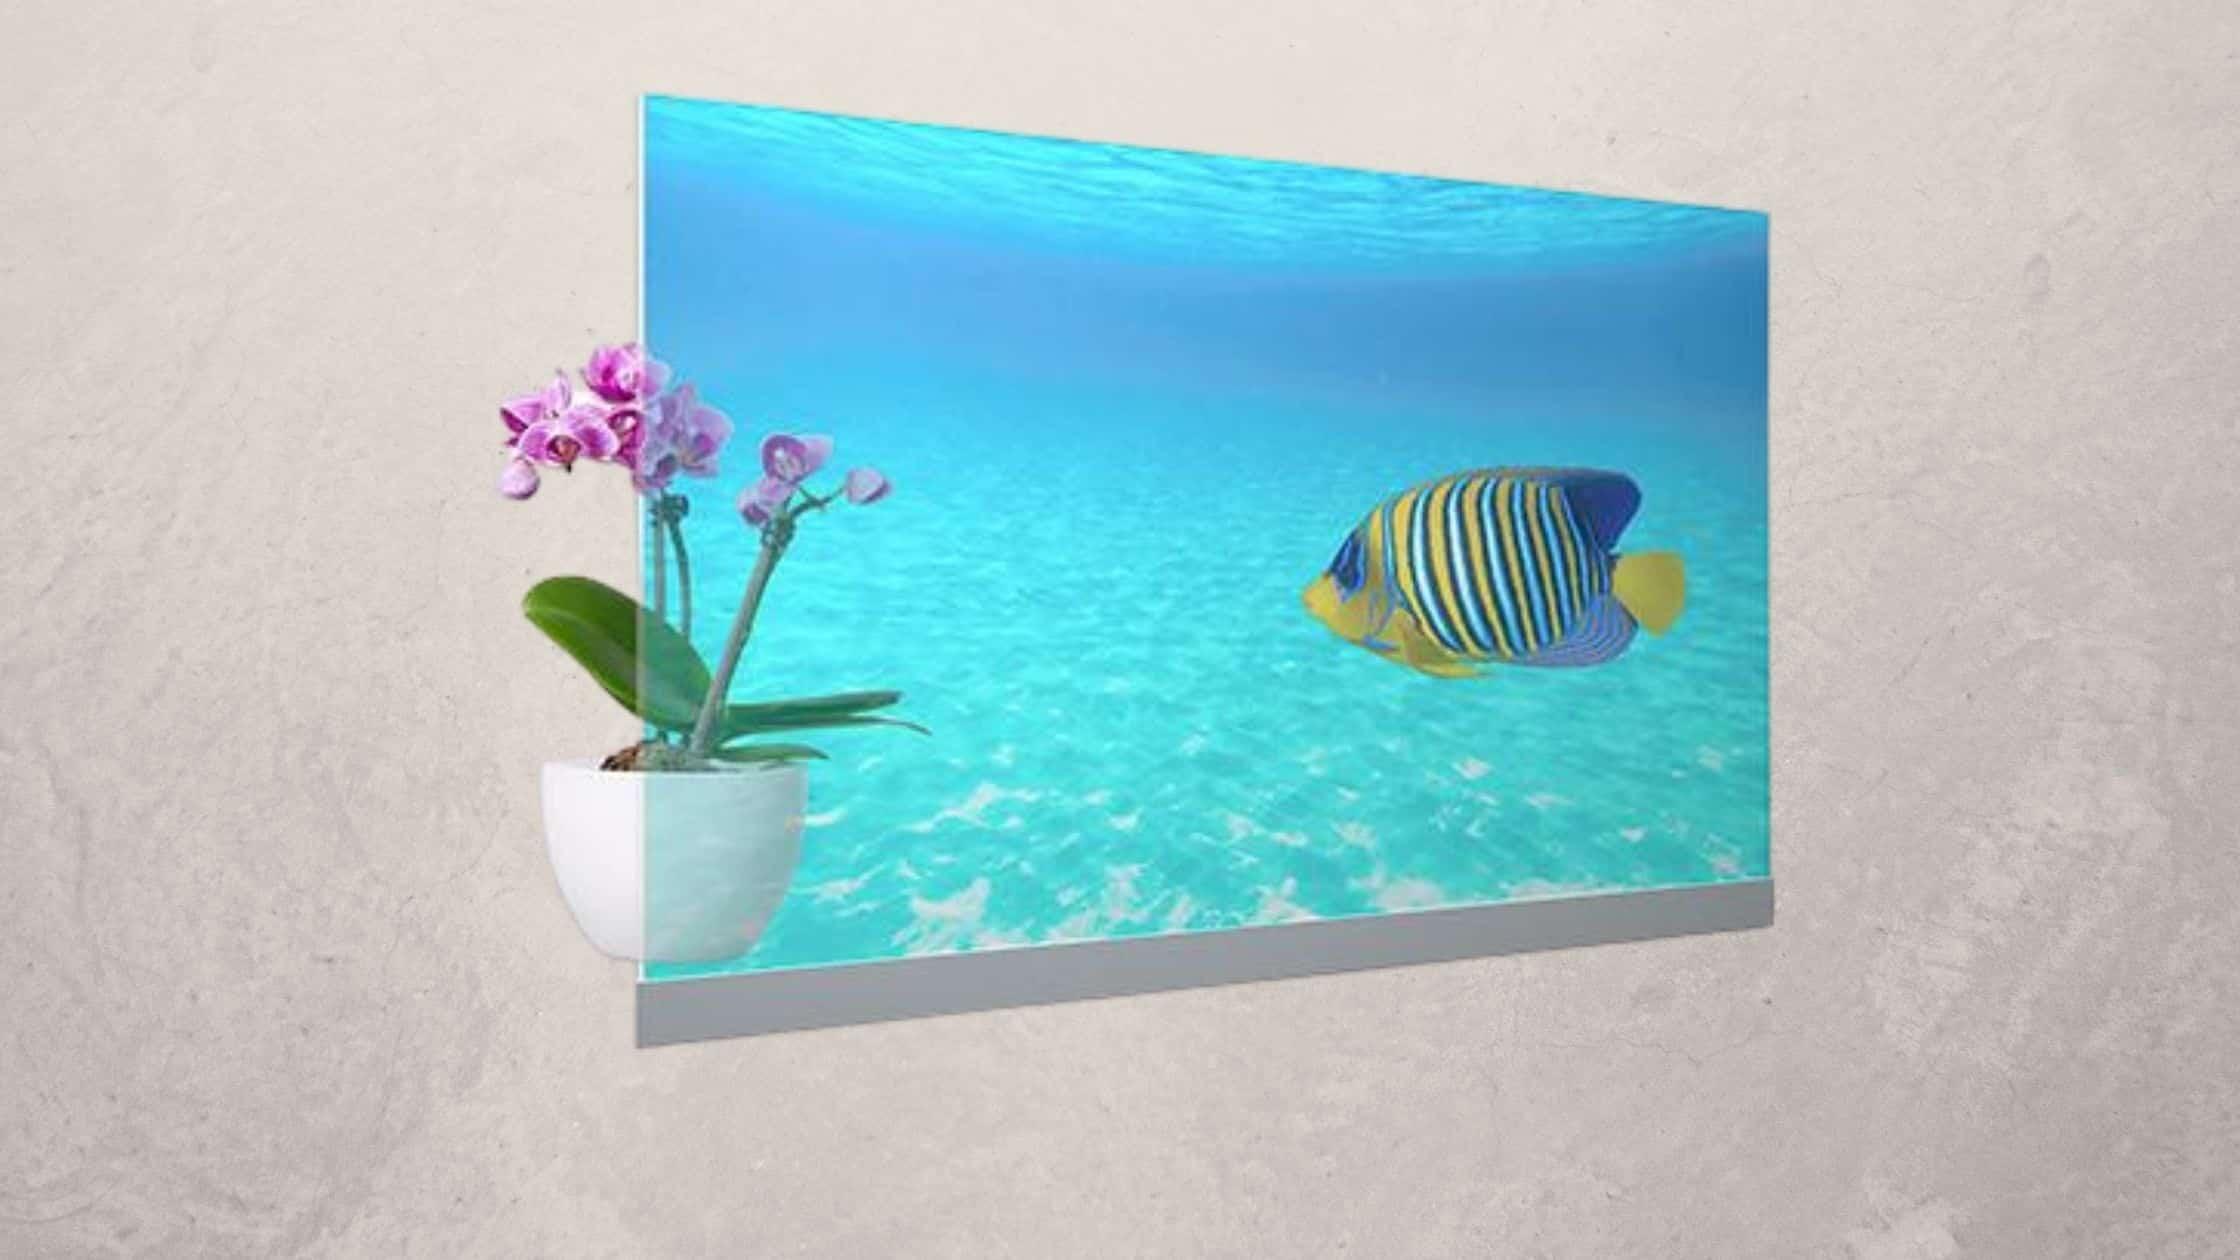 Layar OLED Transparan Panasonic